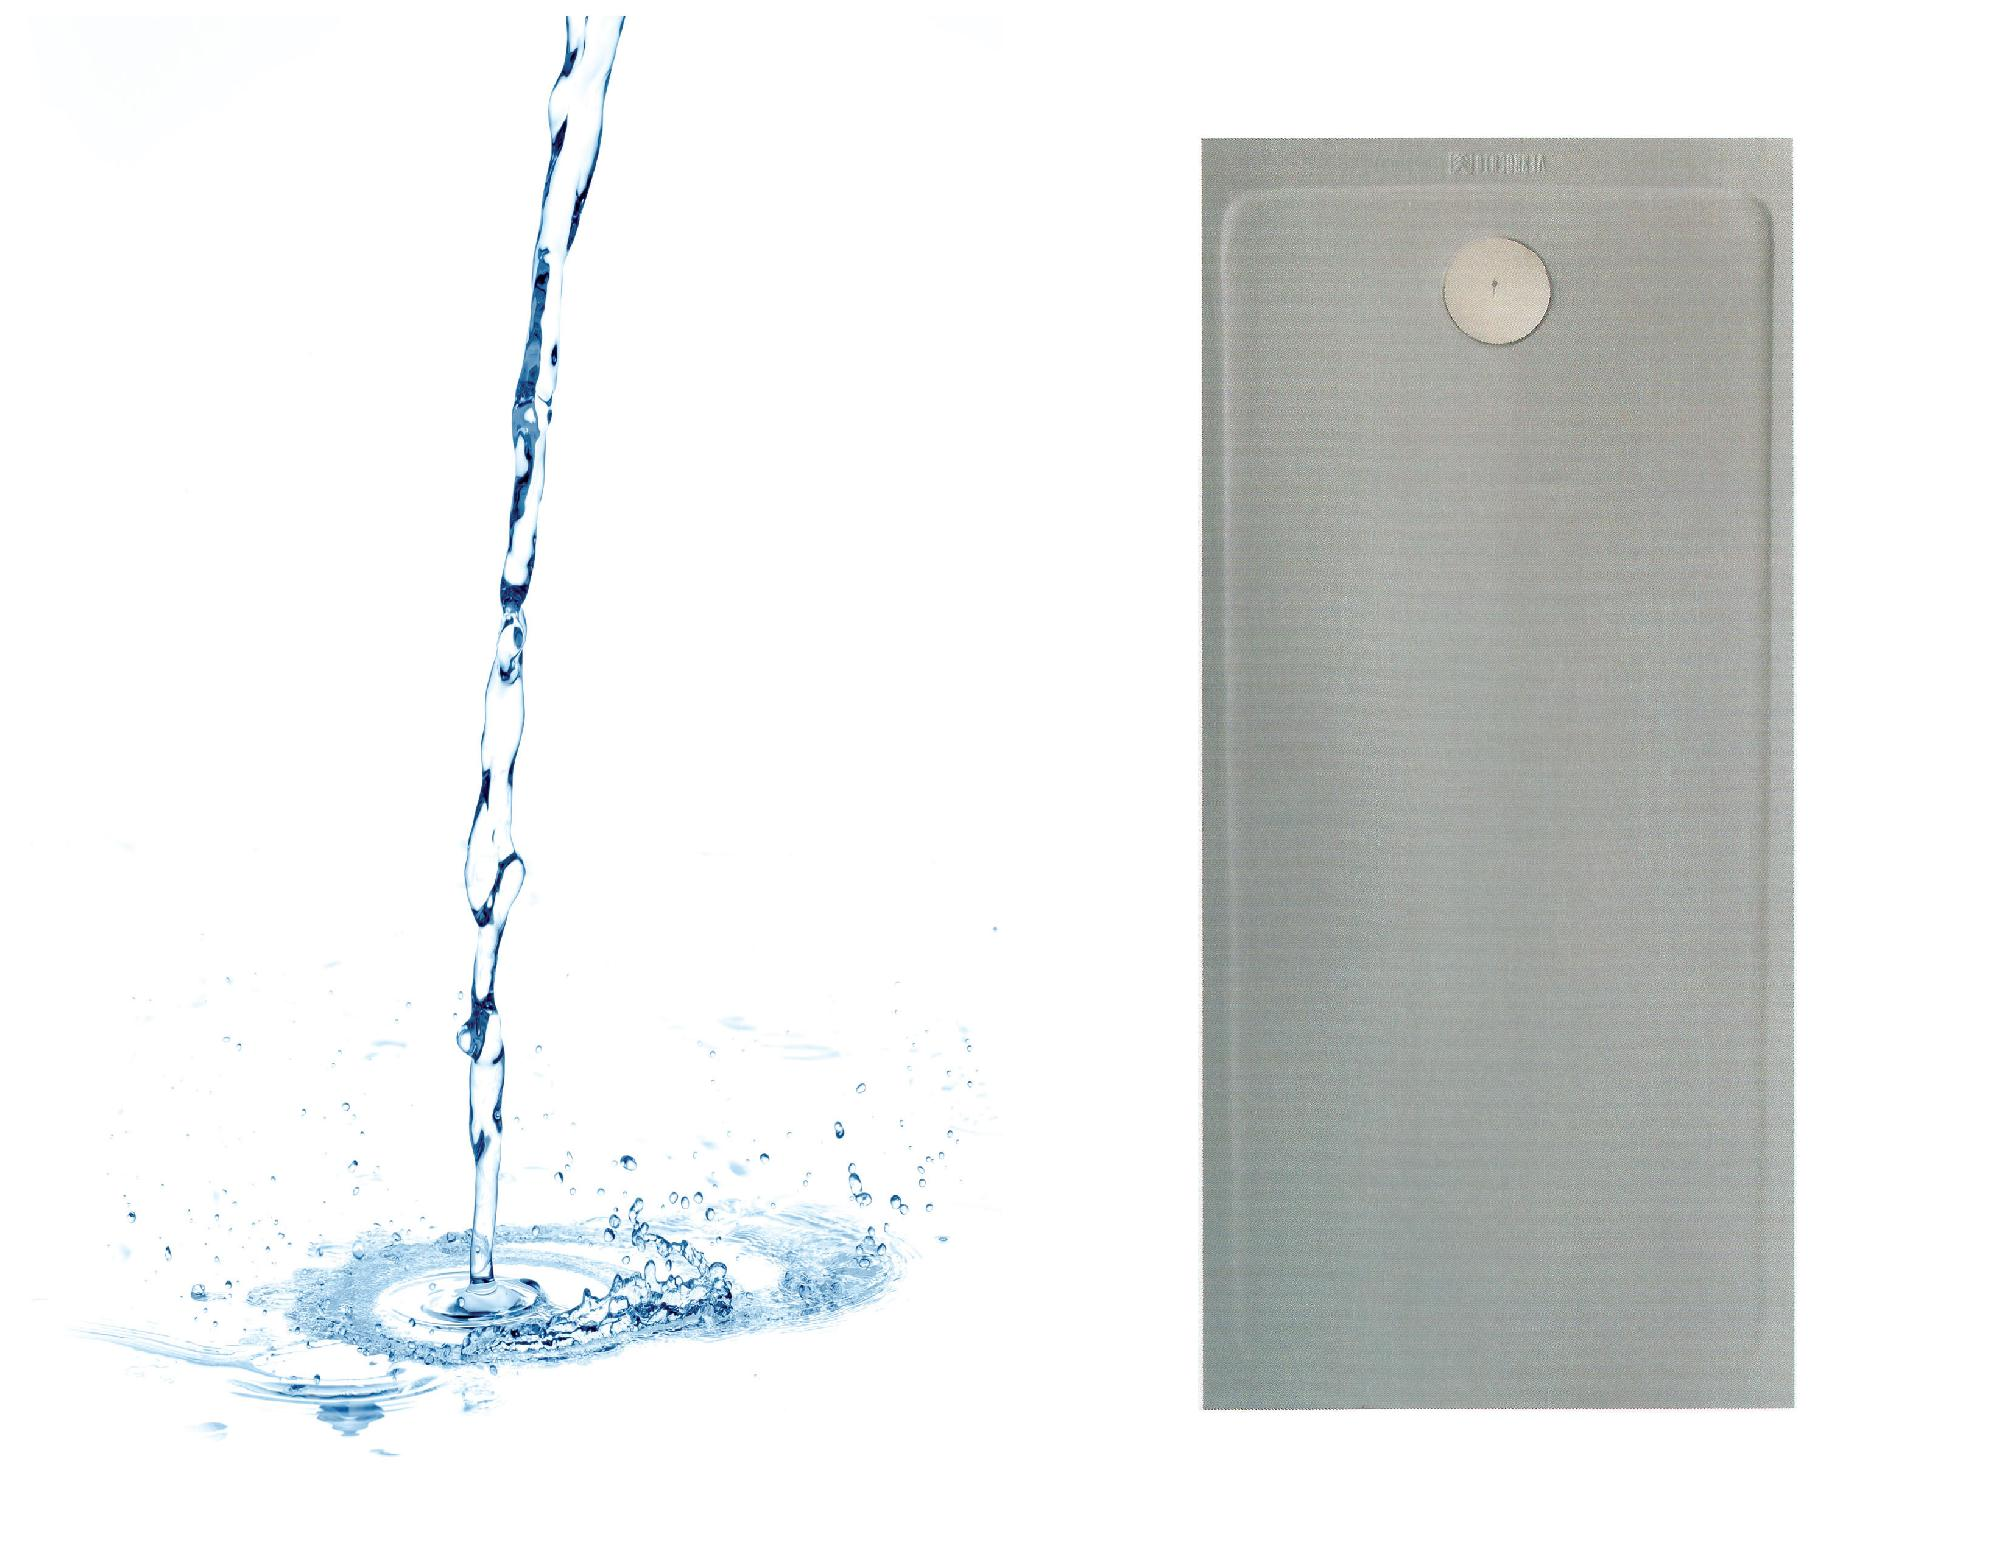 Plato de ducha modelo Pizarra